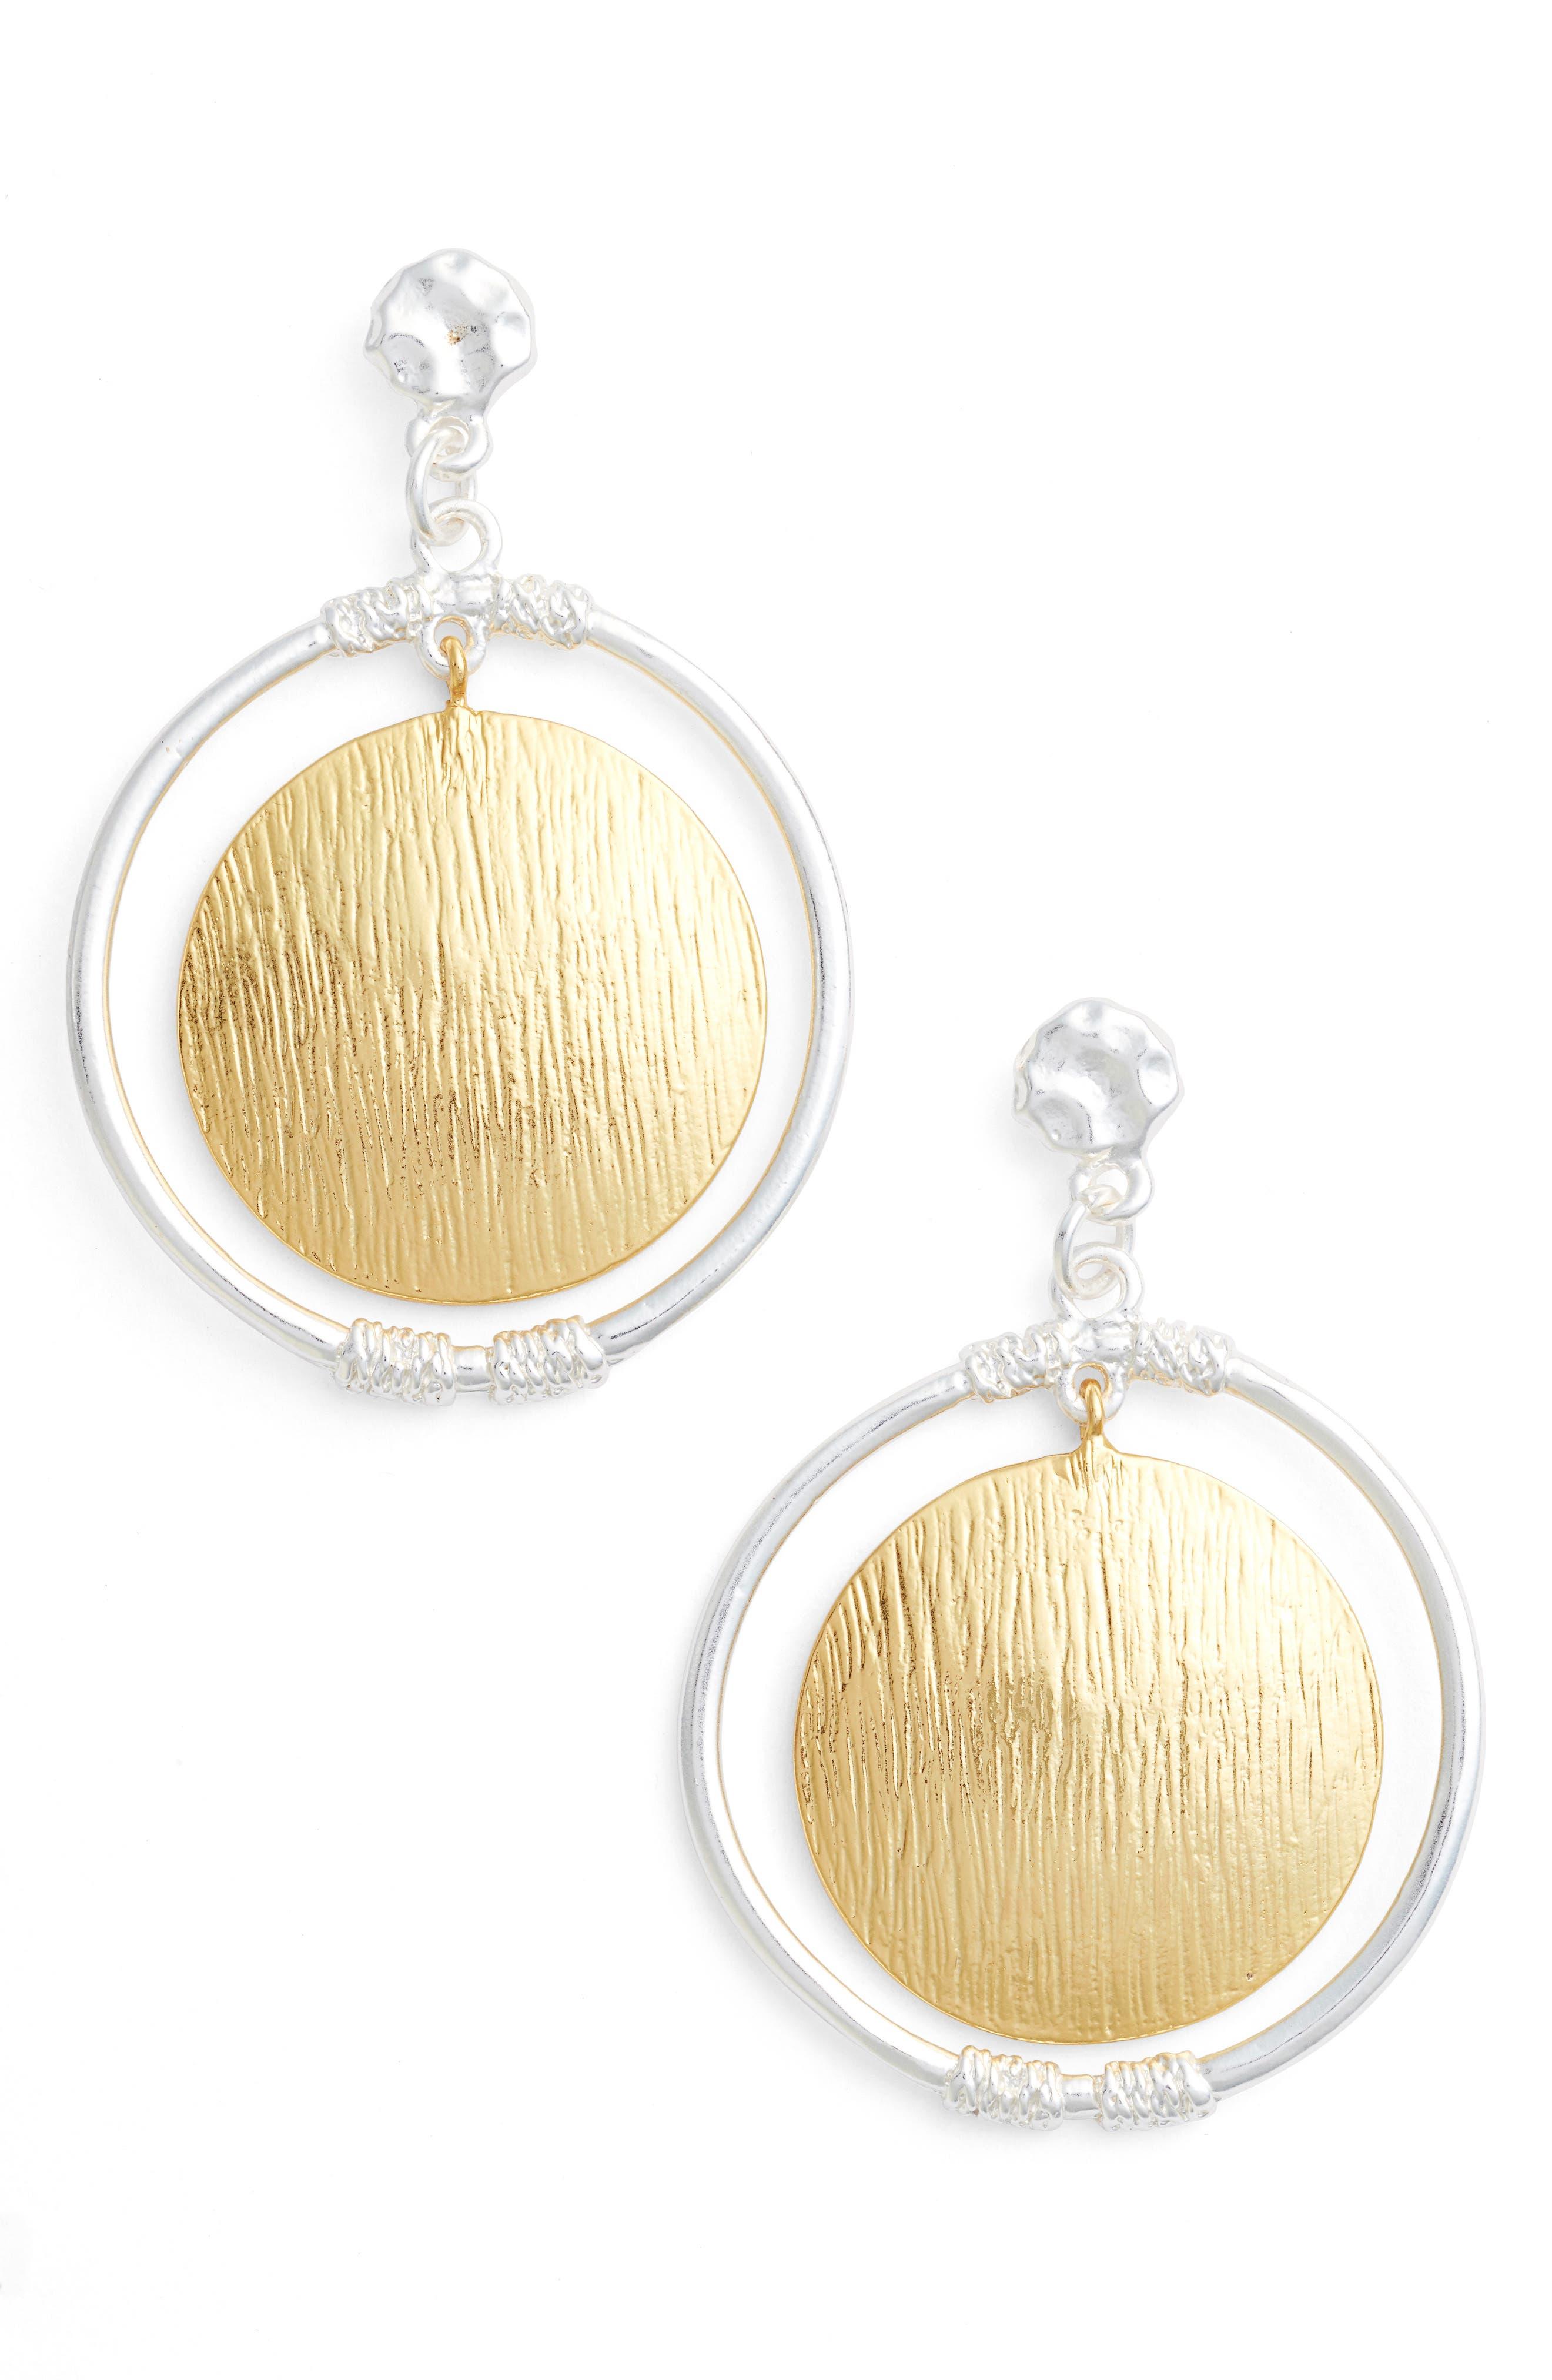 Main Image - Karine Sultan Two-Tone Drop Earrings